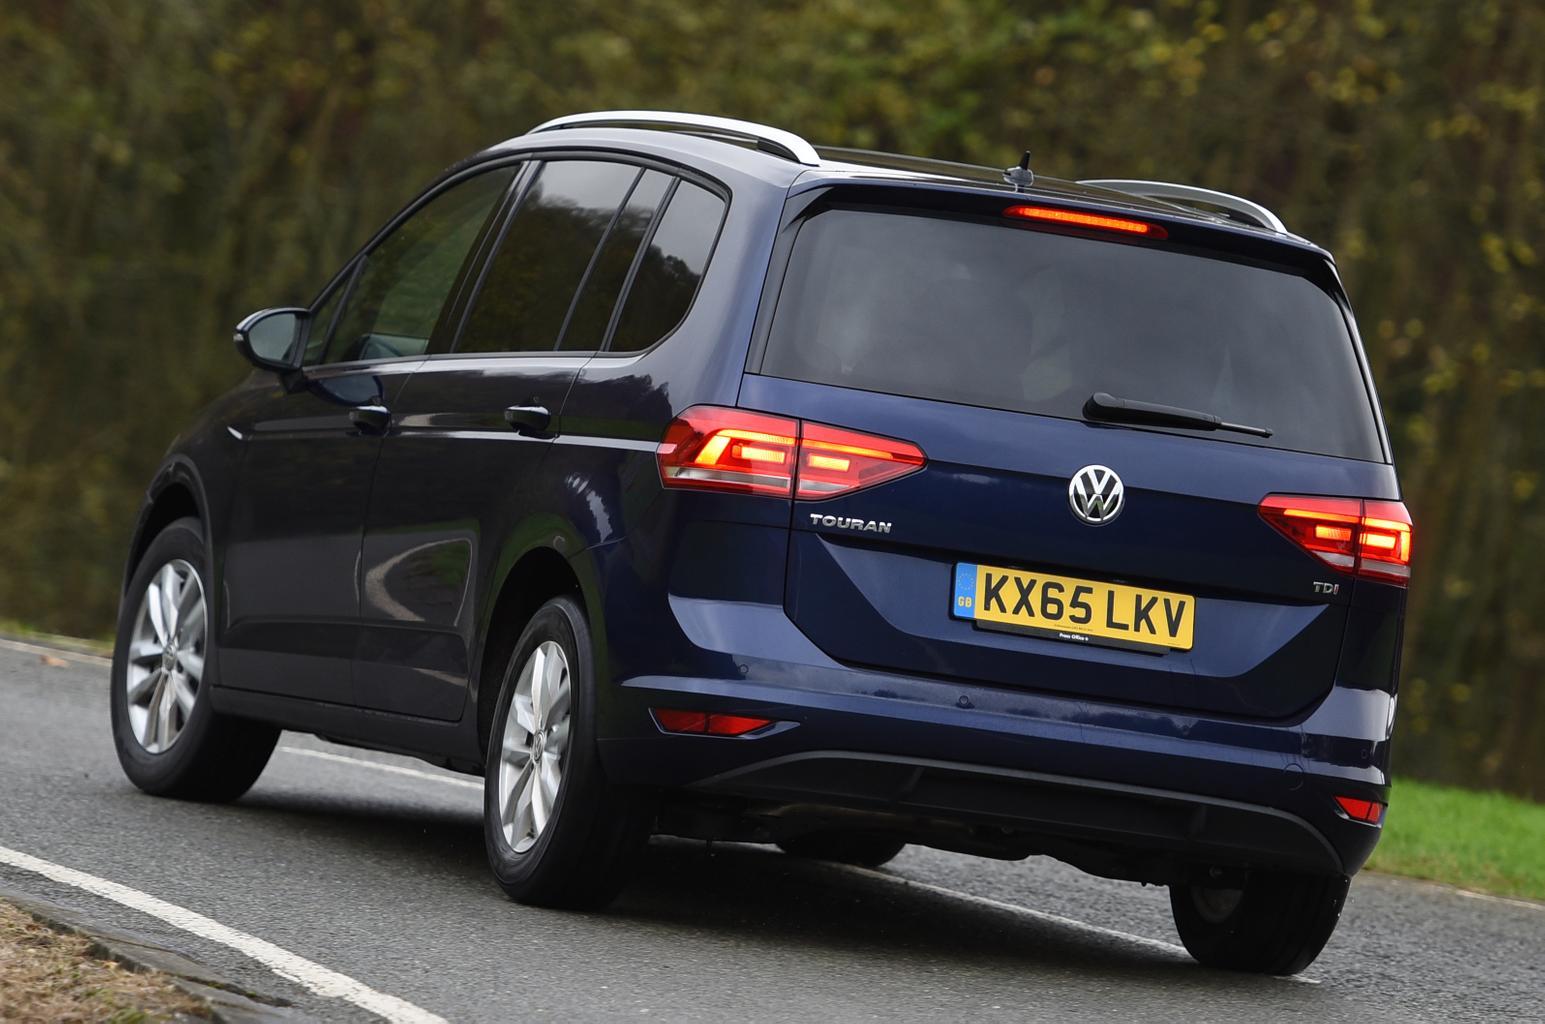 Volkswagen Touran vs Citroen Grand C4 Picasso vs Ford S-Max